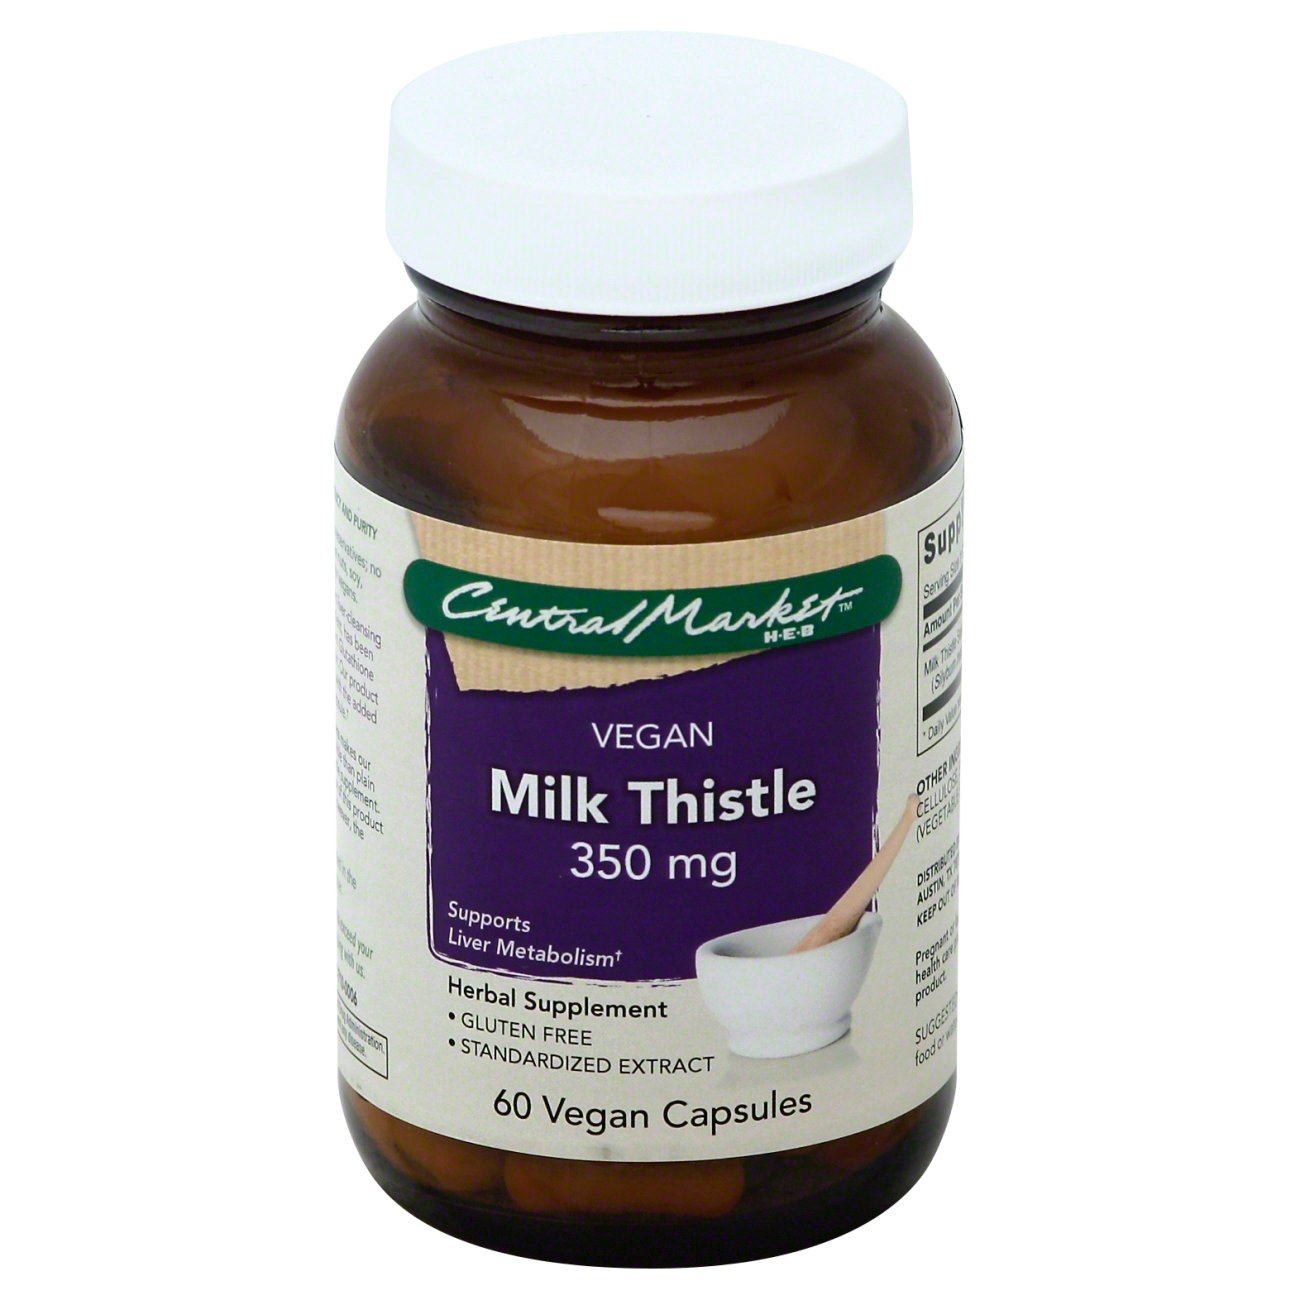 Cheap herbal supplement - Central Market Milk Thistle 350 Mg Vegan Capsules